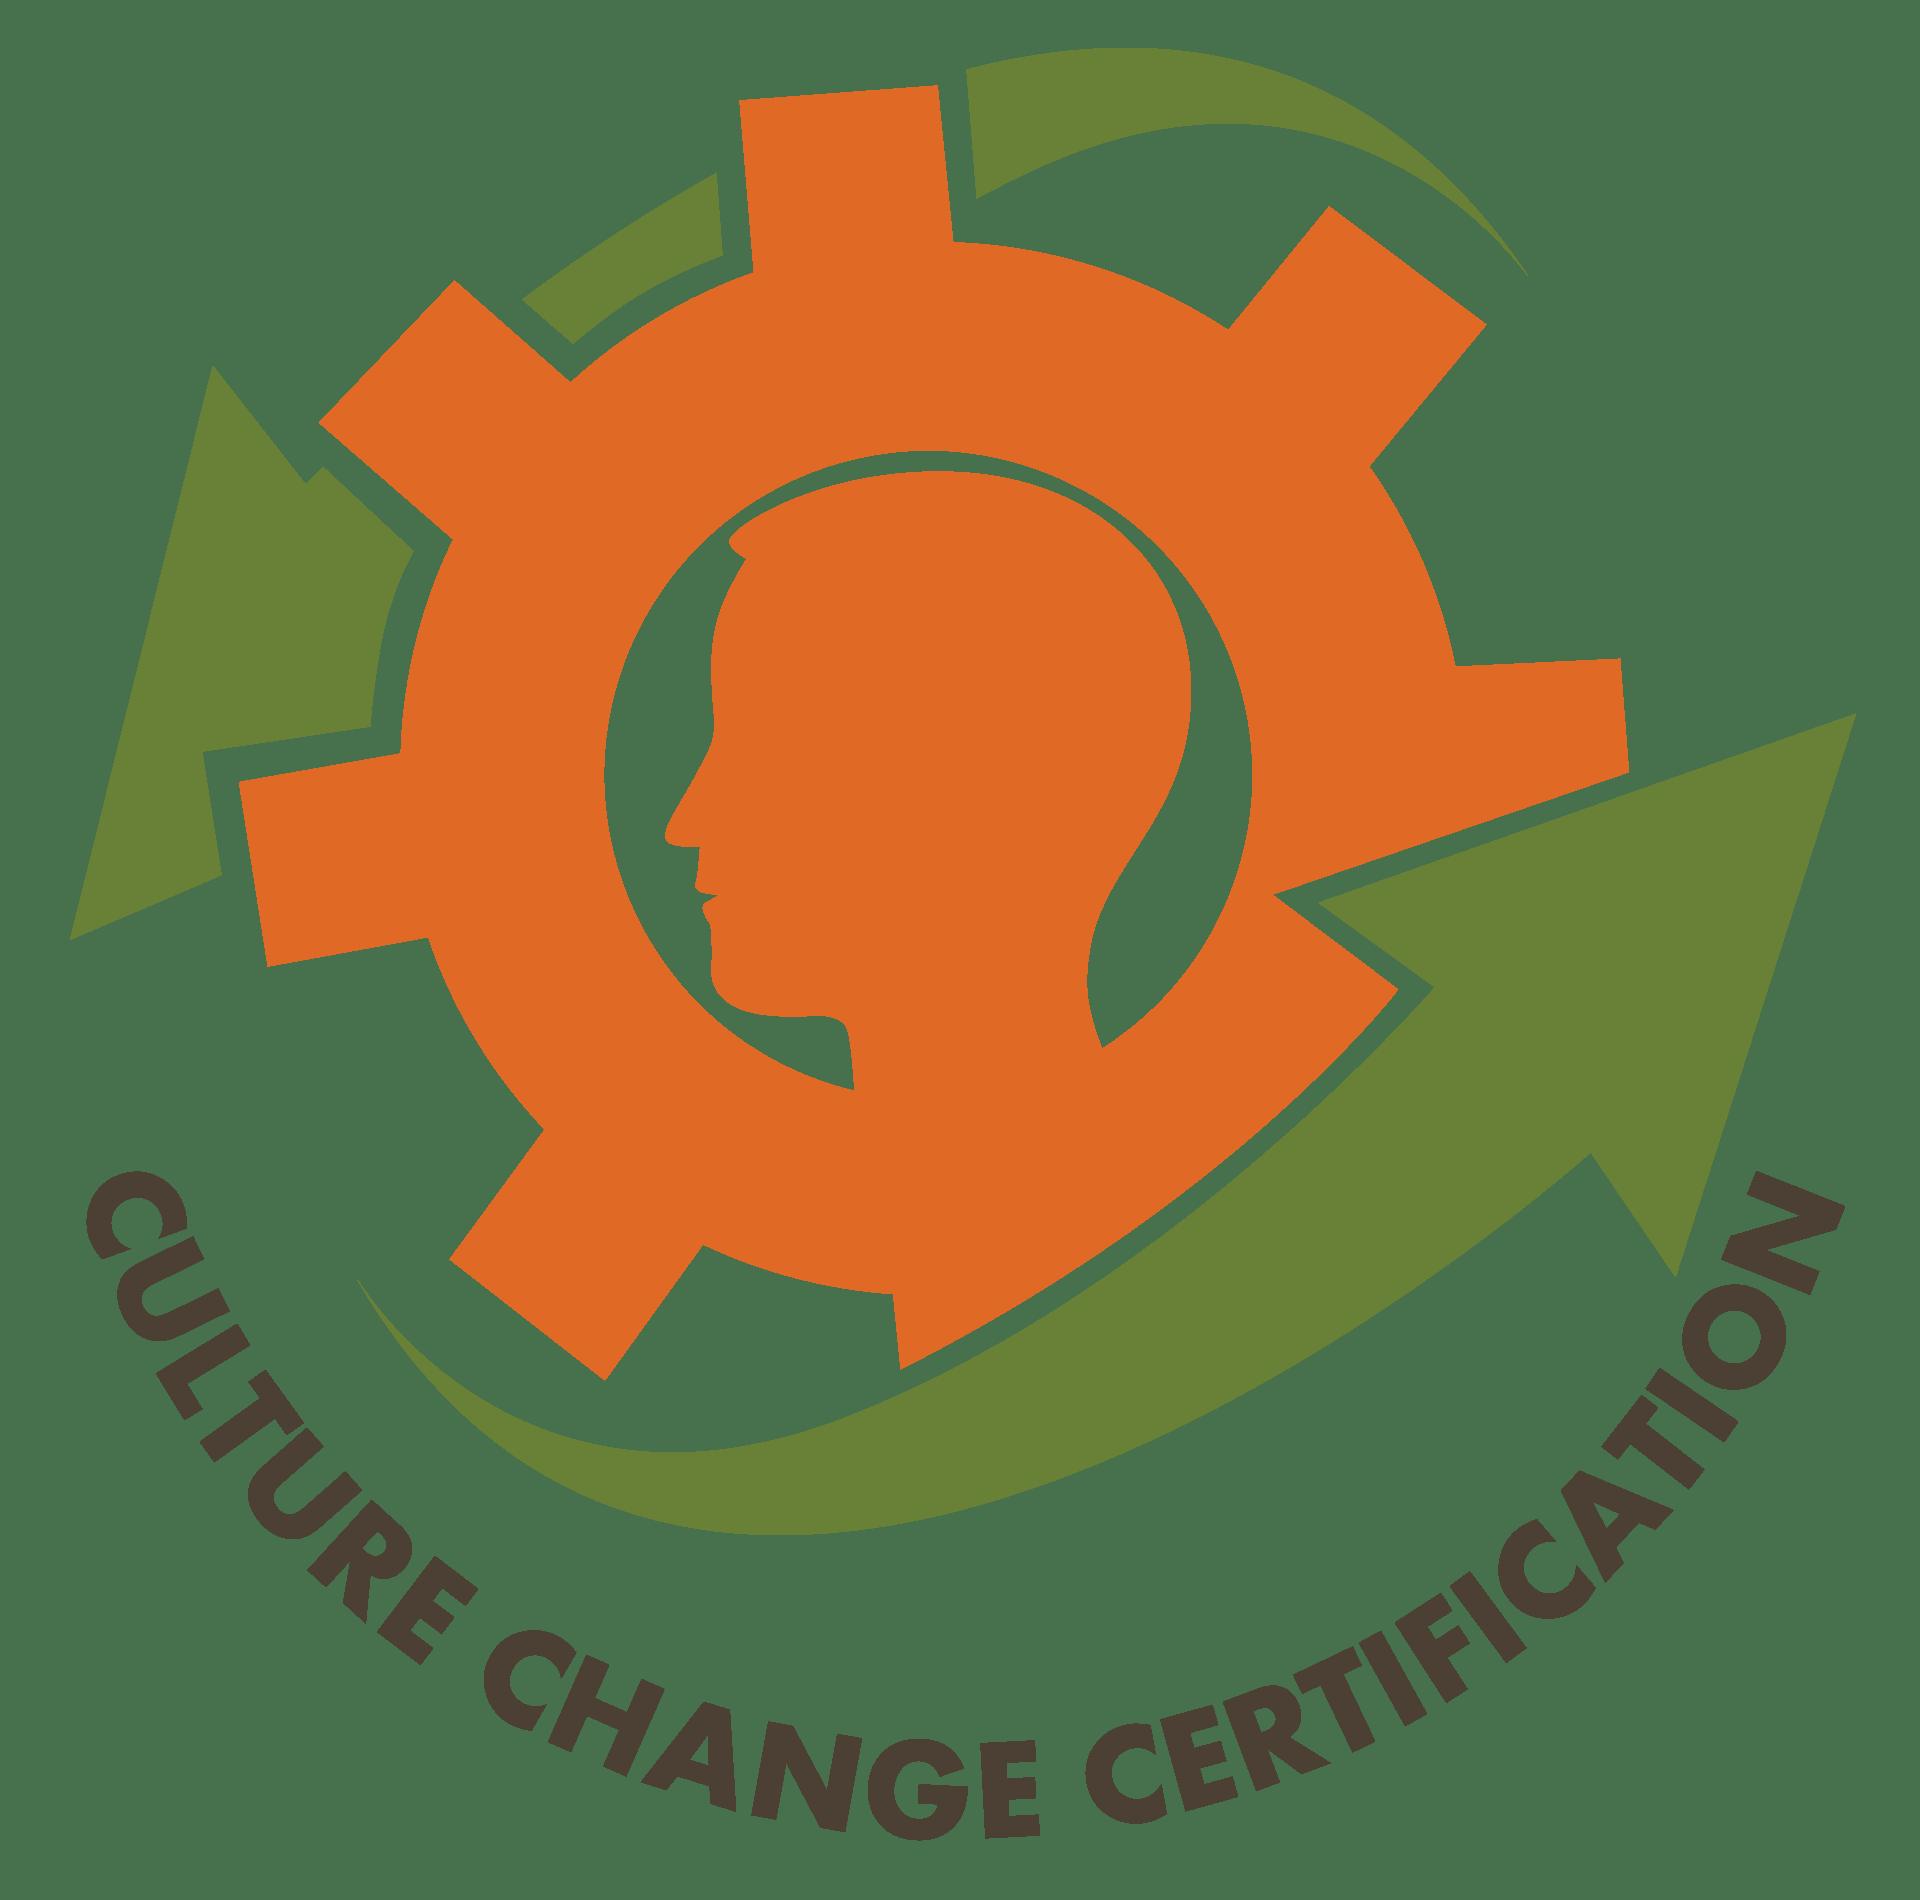 culture-change-certification-logo